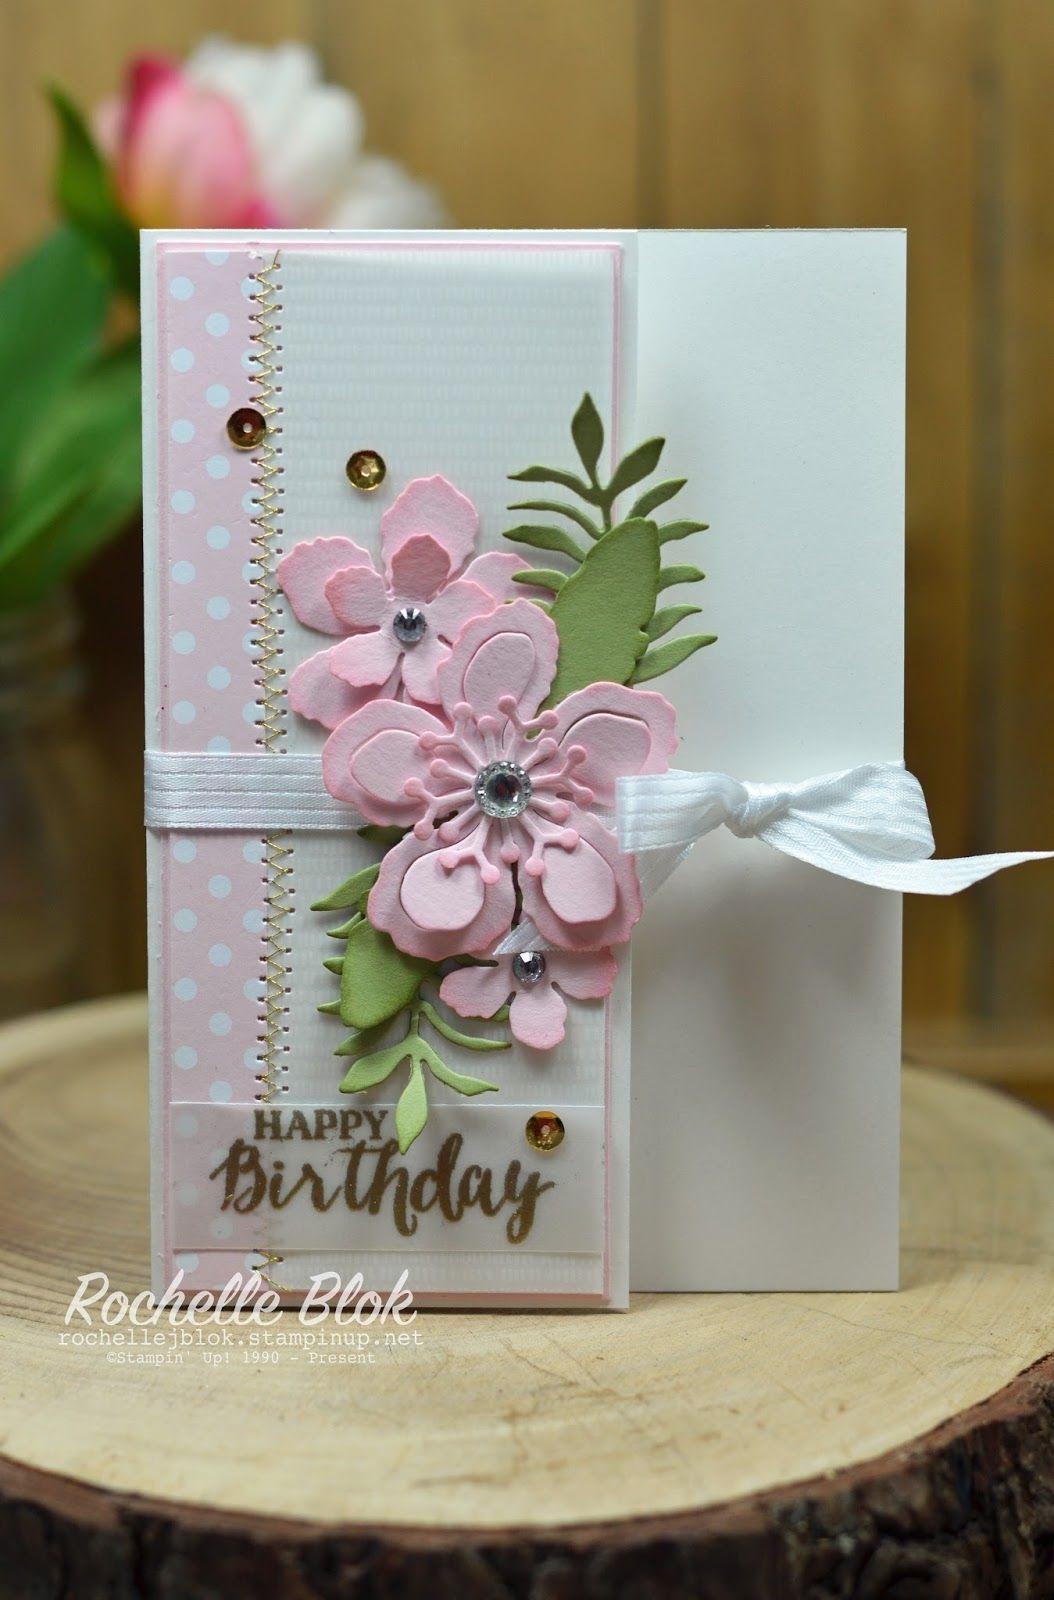 The Stamping Blok: Just Add Ink #299 - Just Add Inspiration - Botanical Builder Thinlits - Rochelle Blok